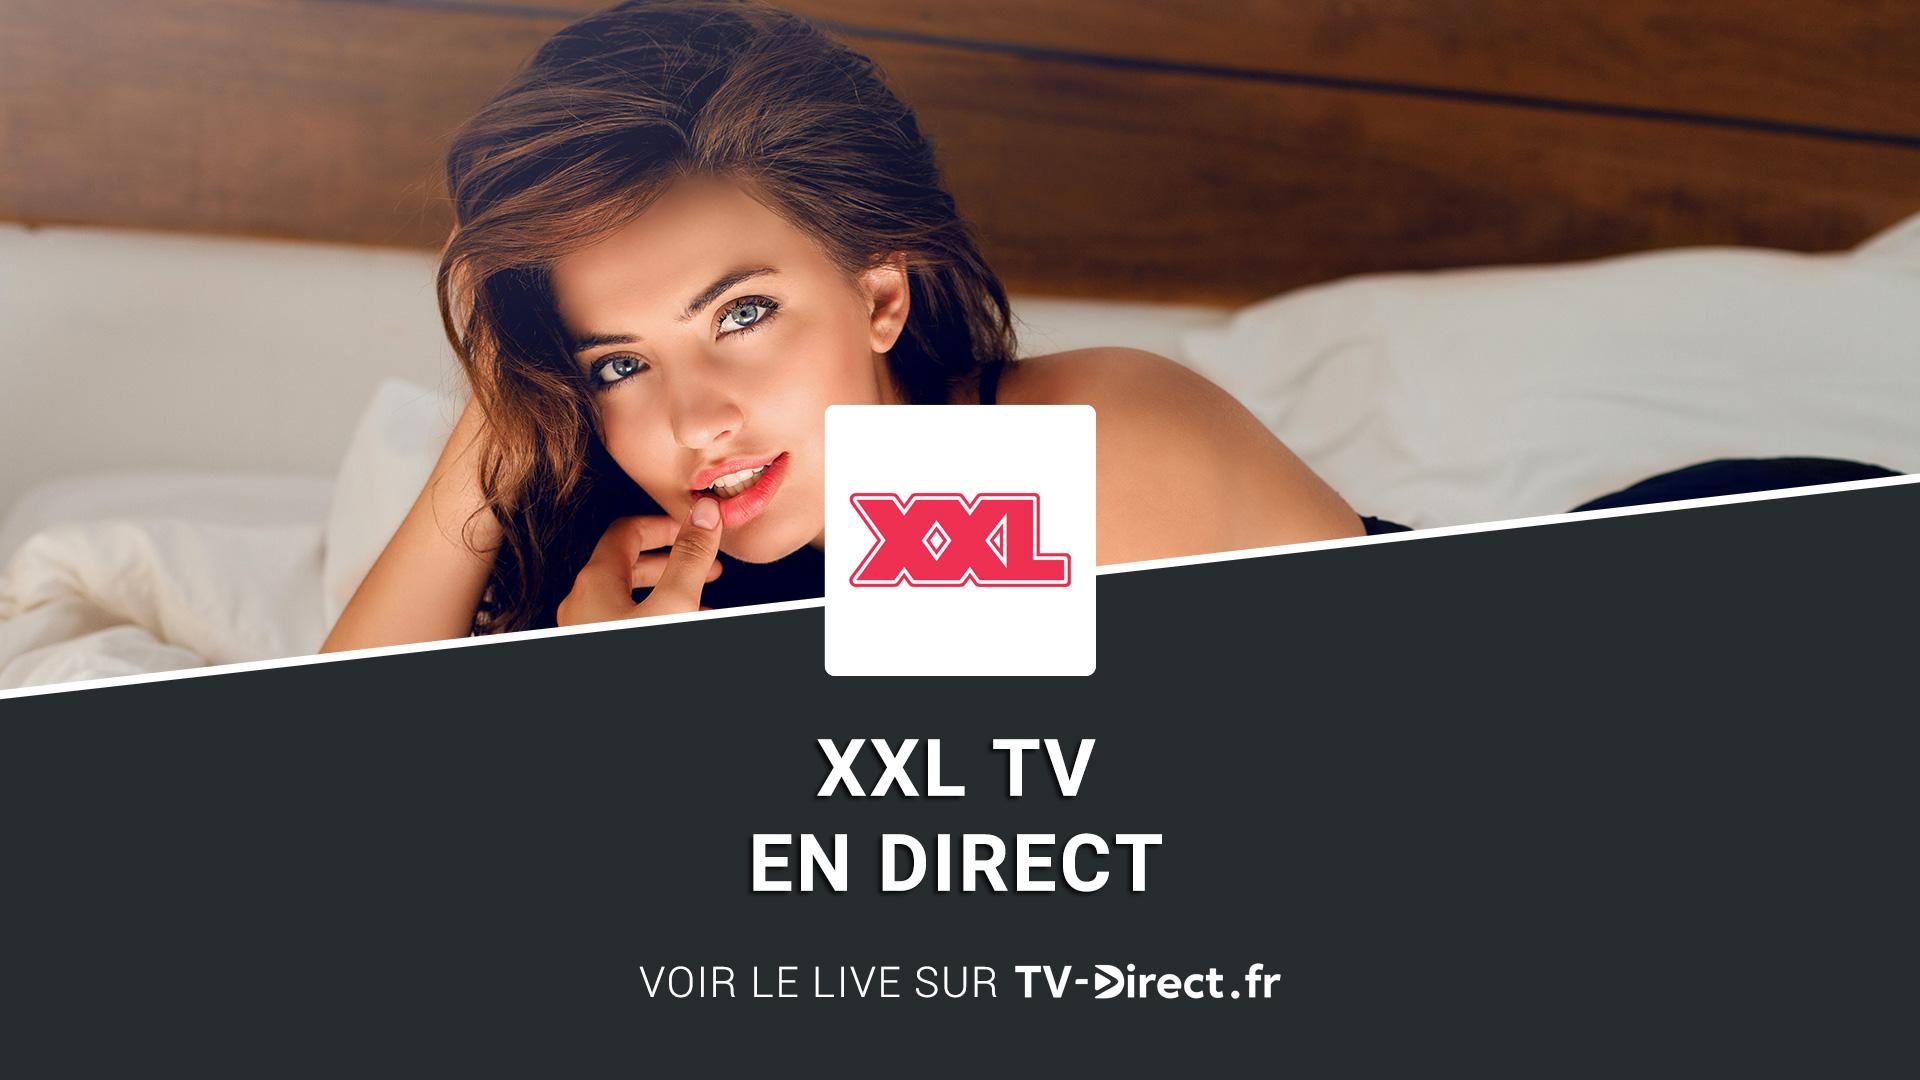 Xxl Live Tv